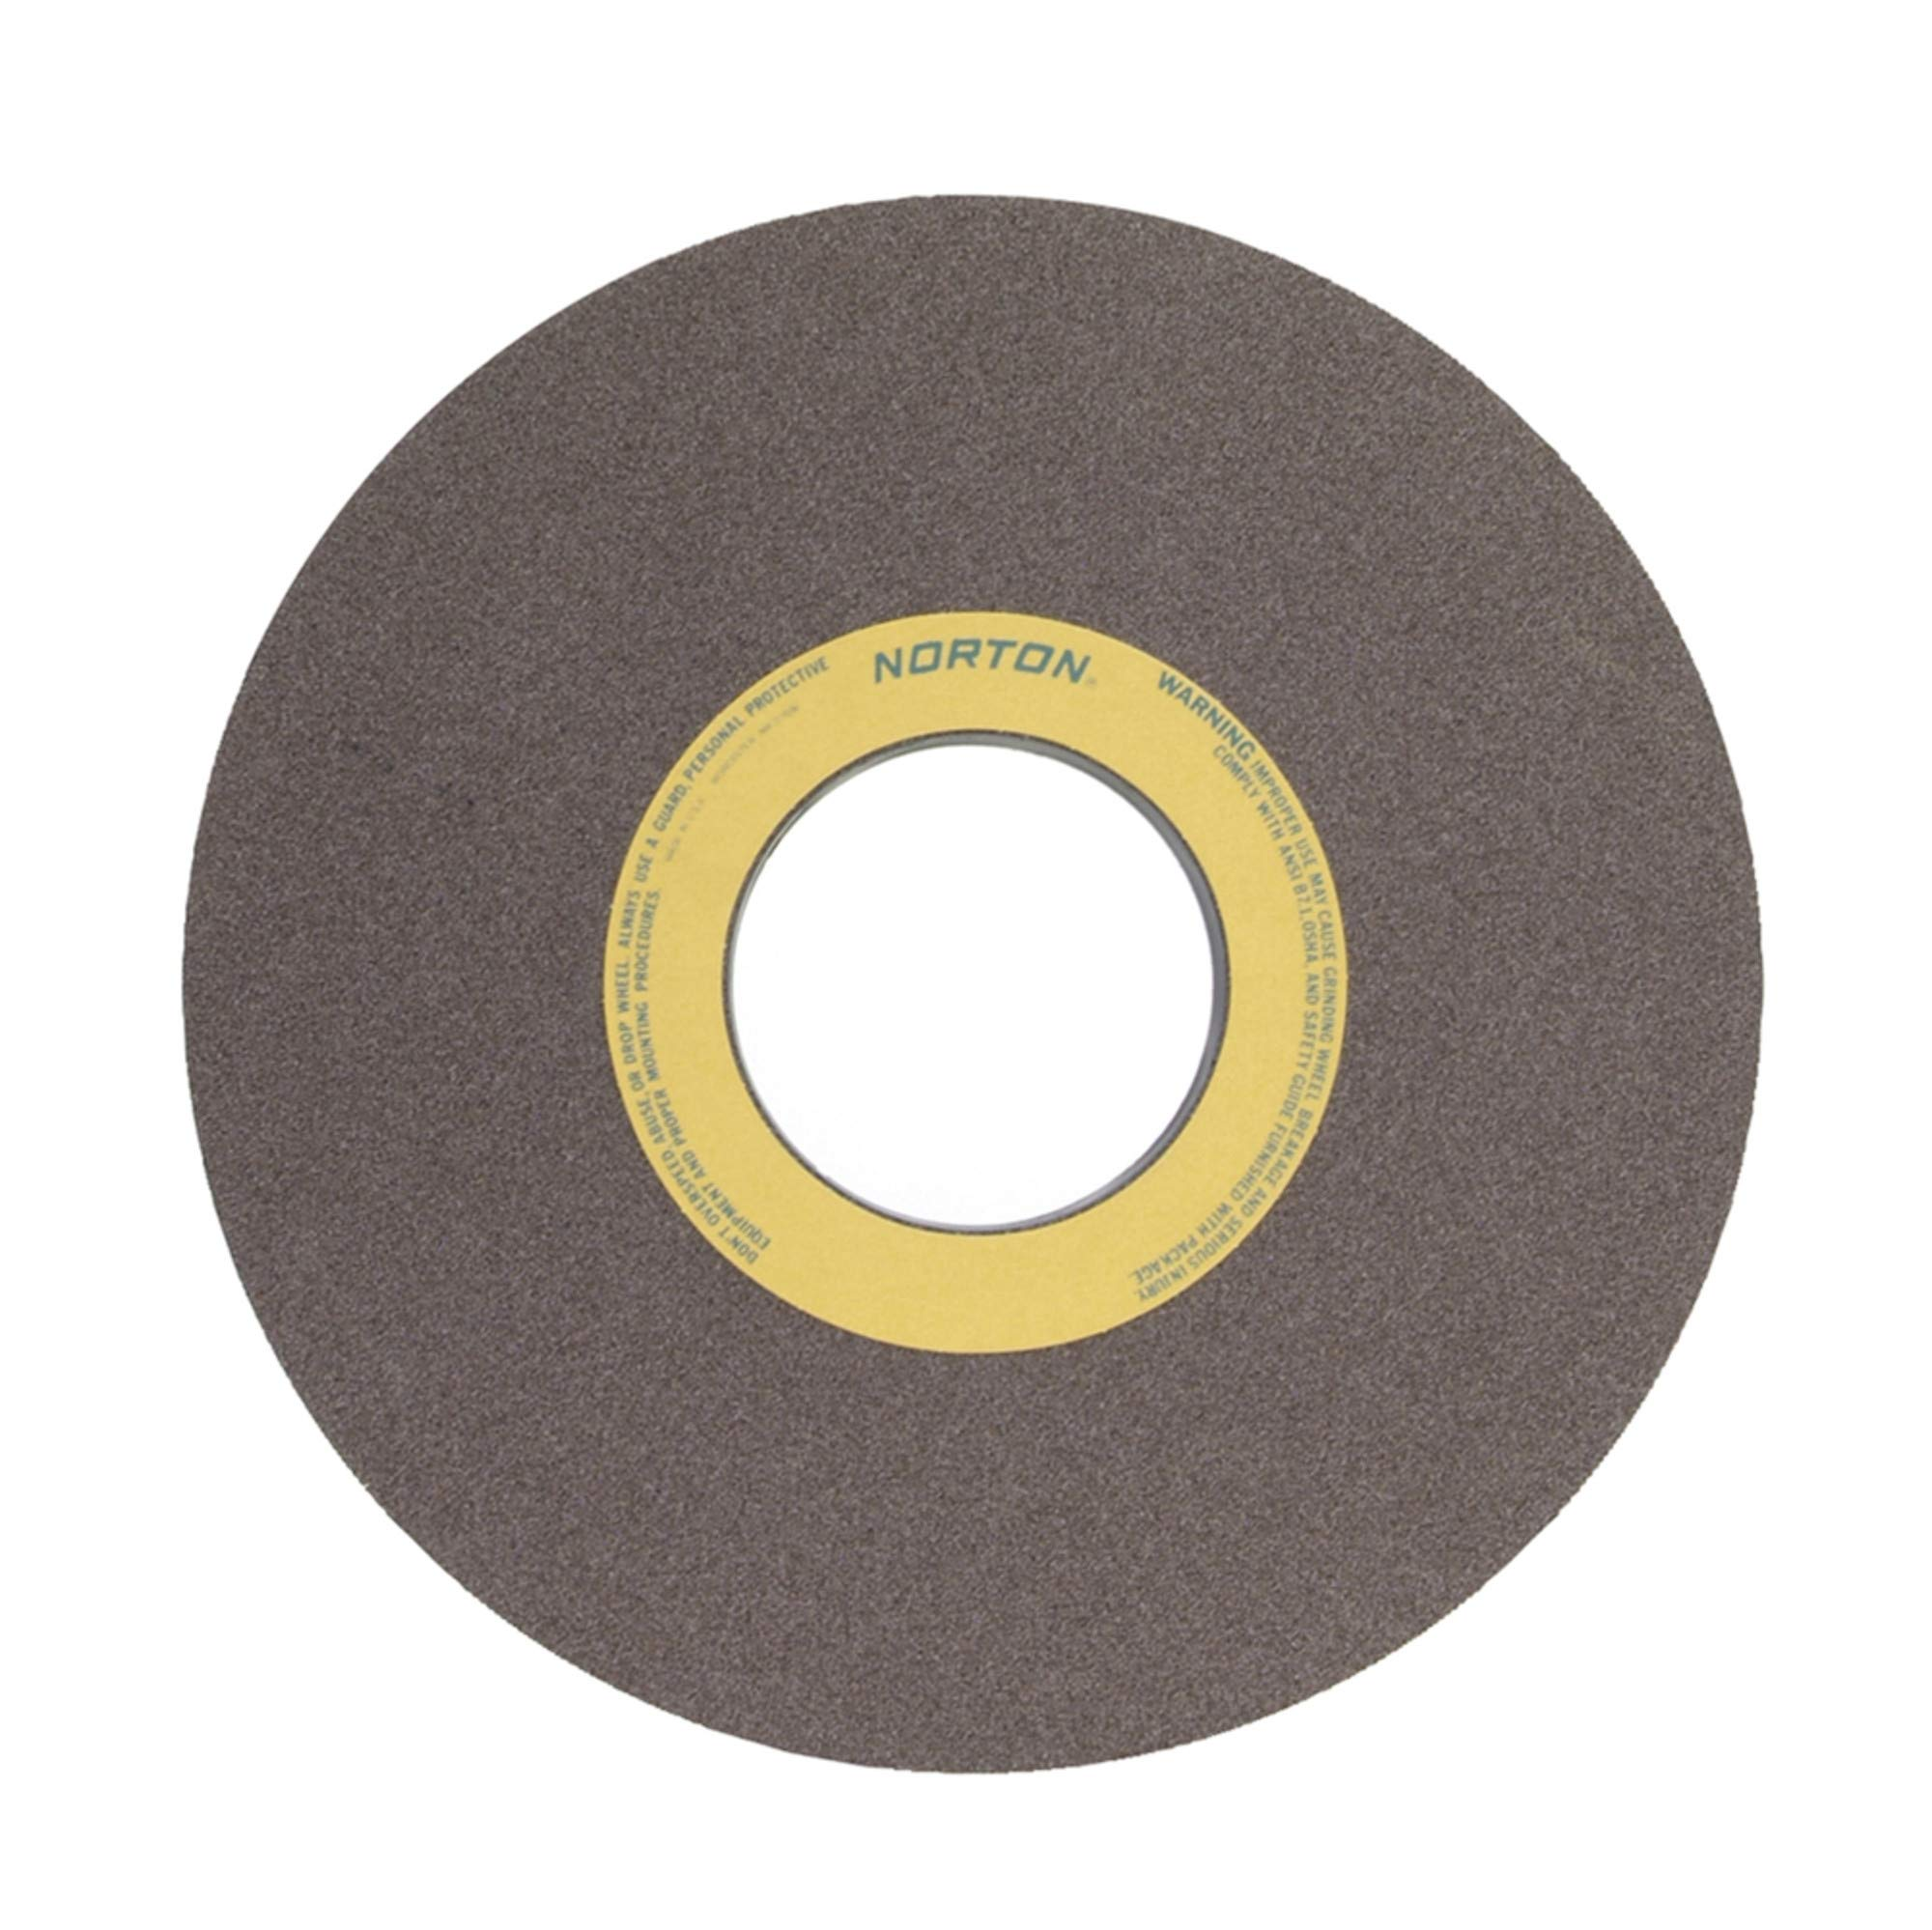 Norton 69210466704 Surface Grinding Wheels Size 30 x 2 x 12